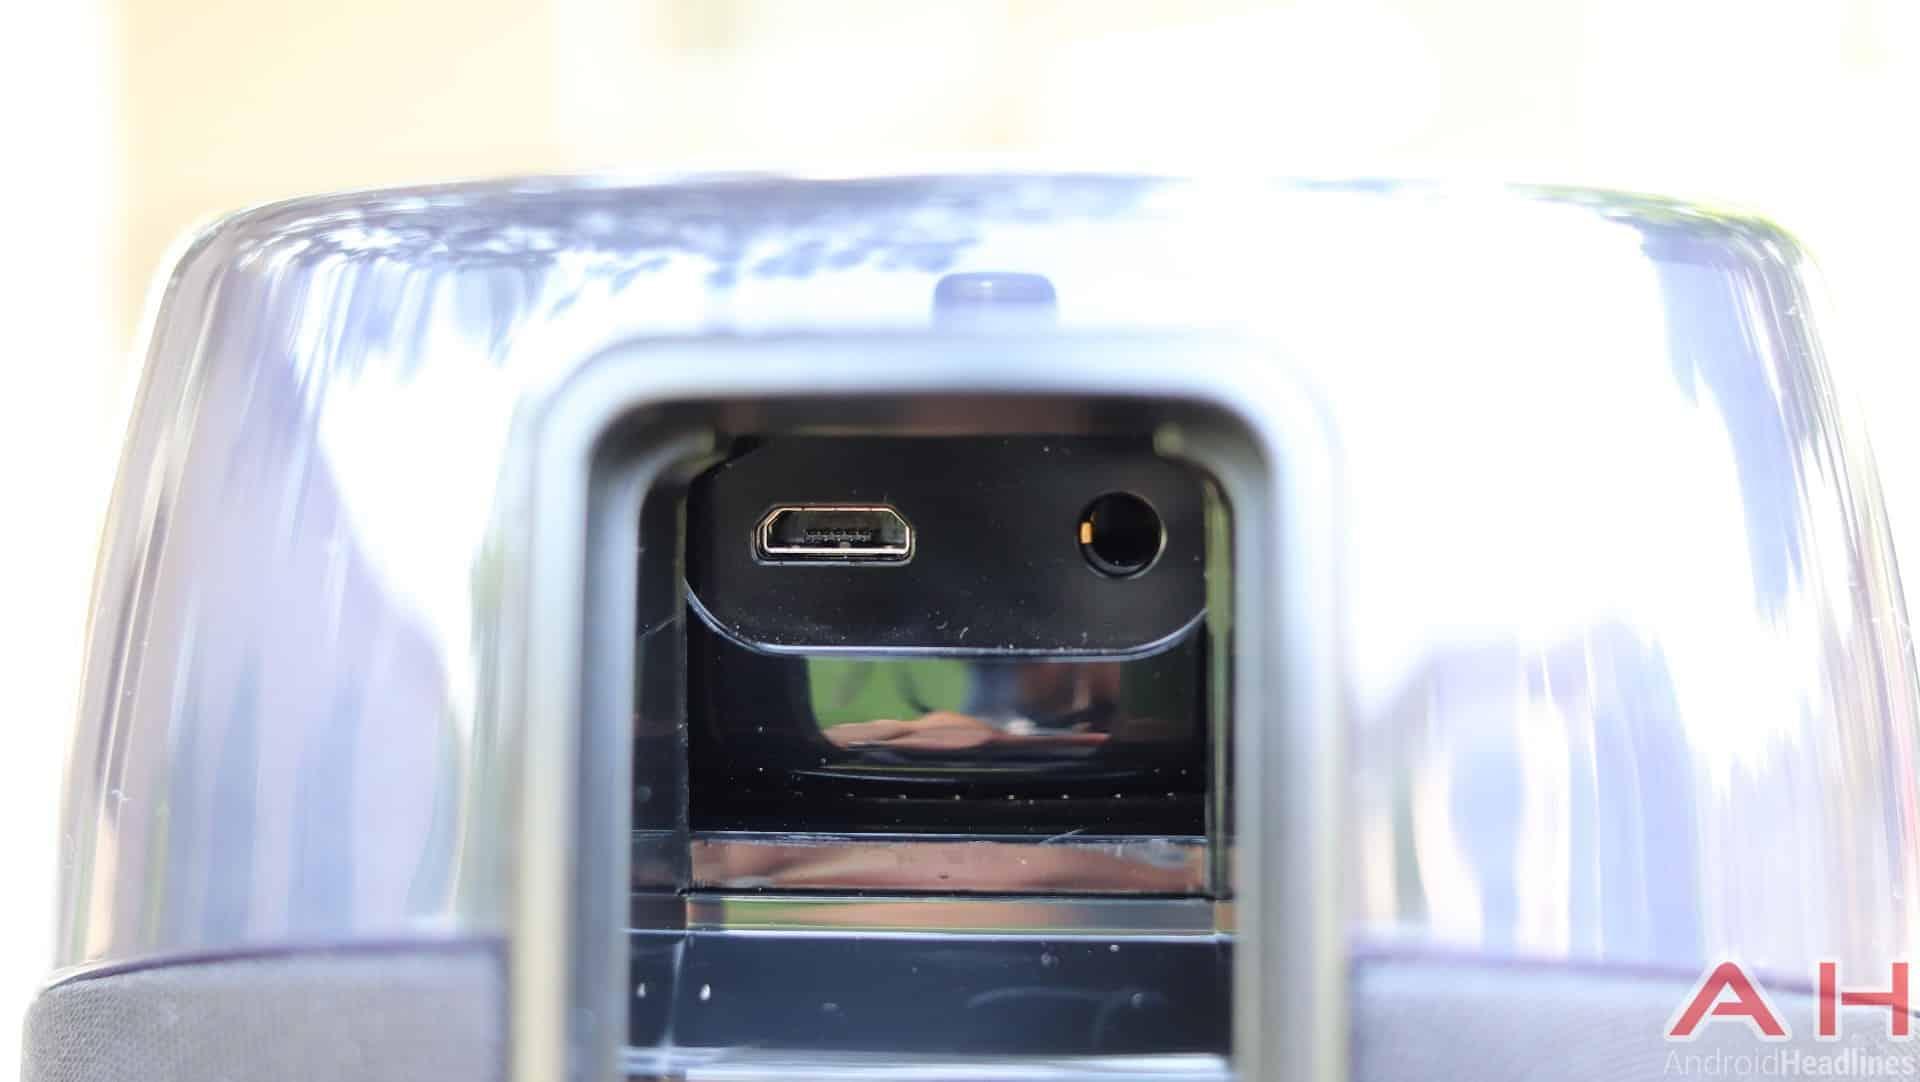 iHome iAV5 Echo Dot Dock Bluetooth Speaker Review Hardware Gall 12